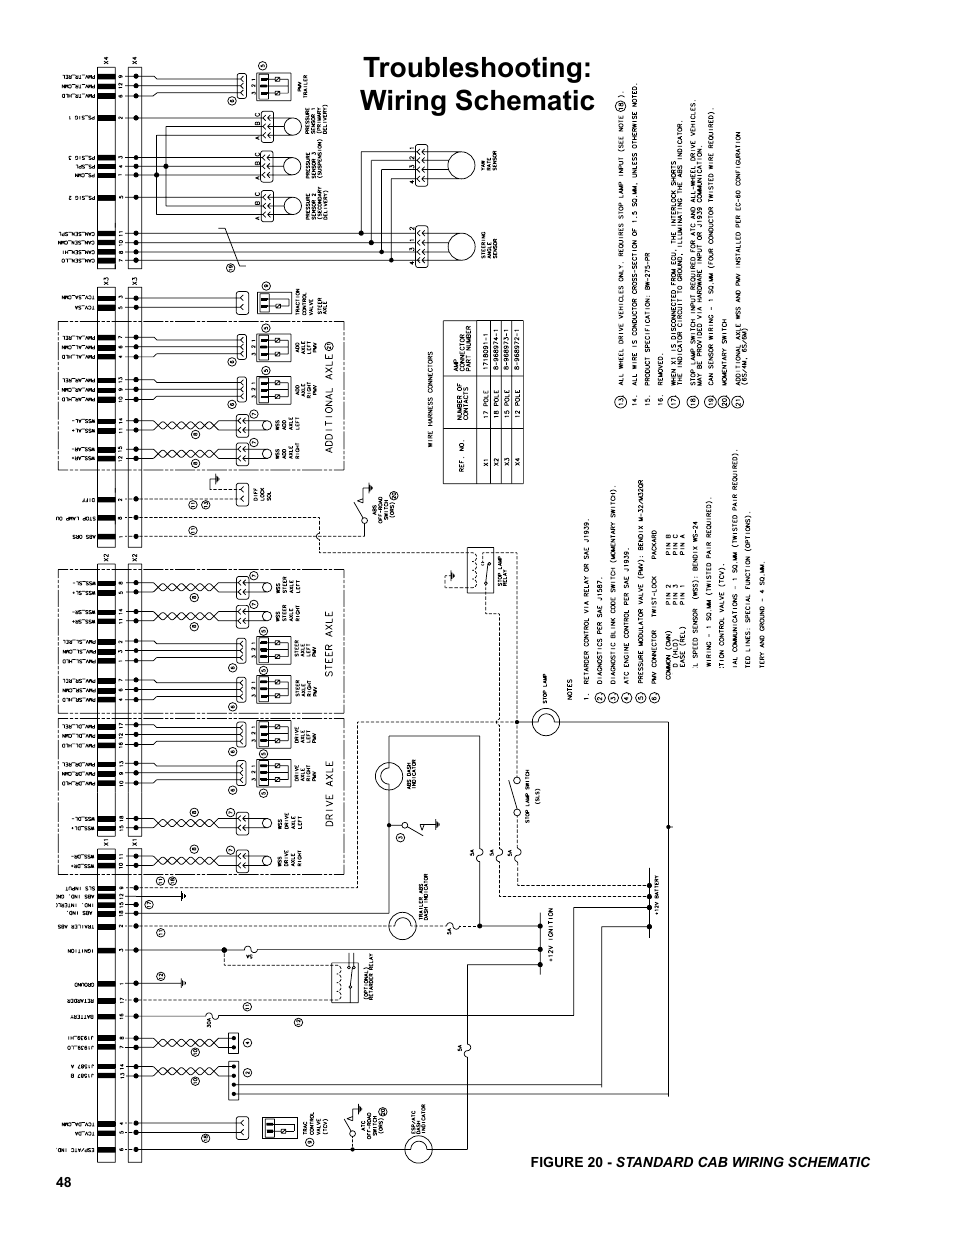 bendix wiring diagrams wiring schematic diagram bendix wiring diagrams wiring diagram